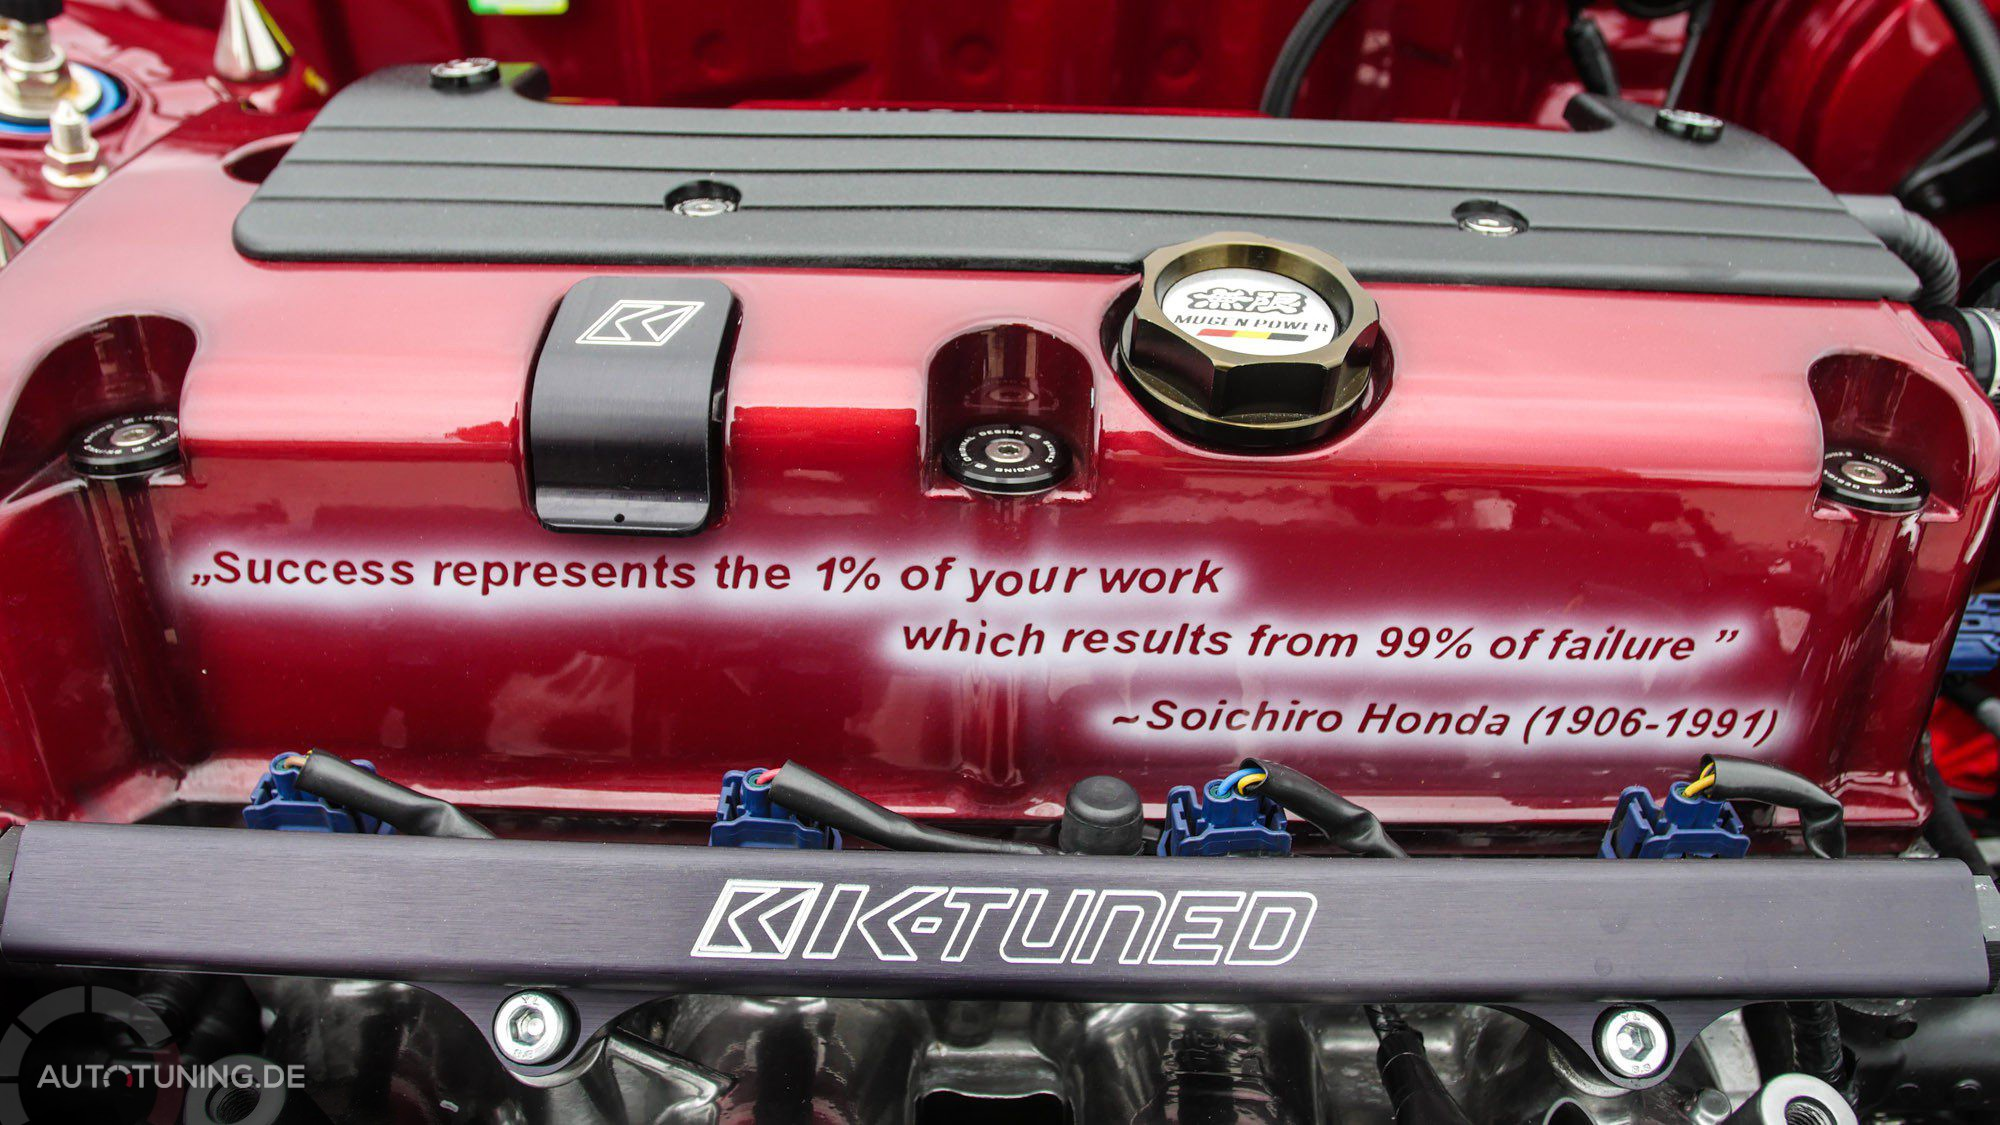 Zitat des Honda-Gründers auf dem Motorblock des Honda Civic